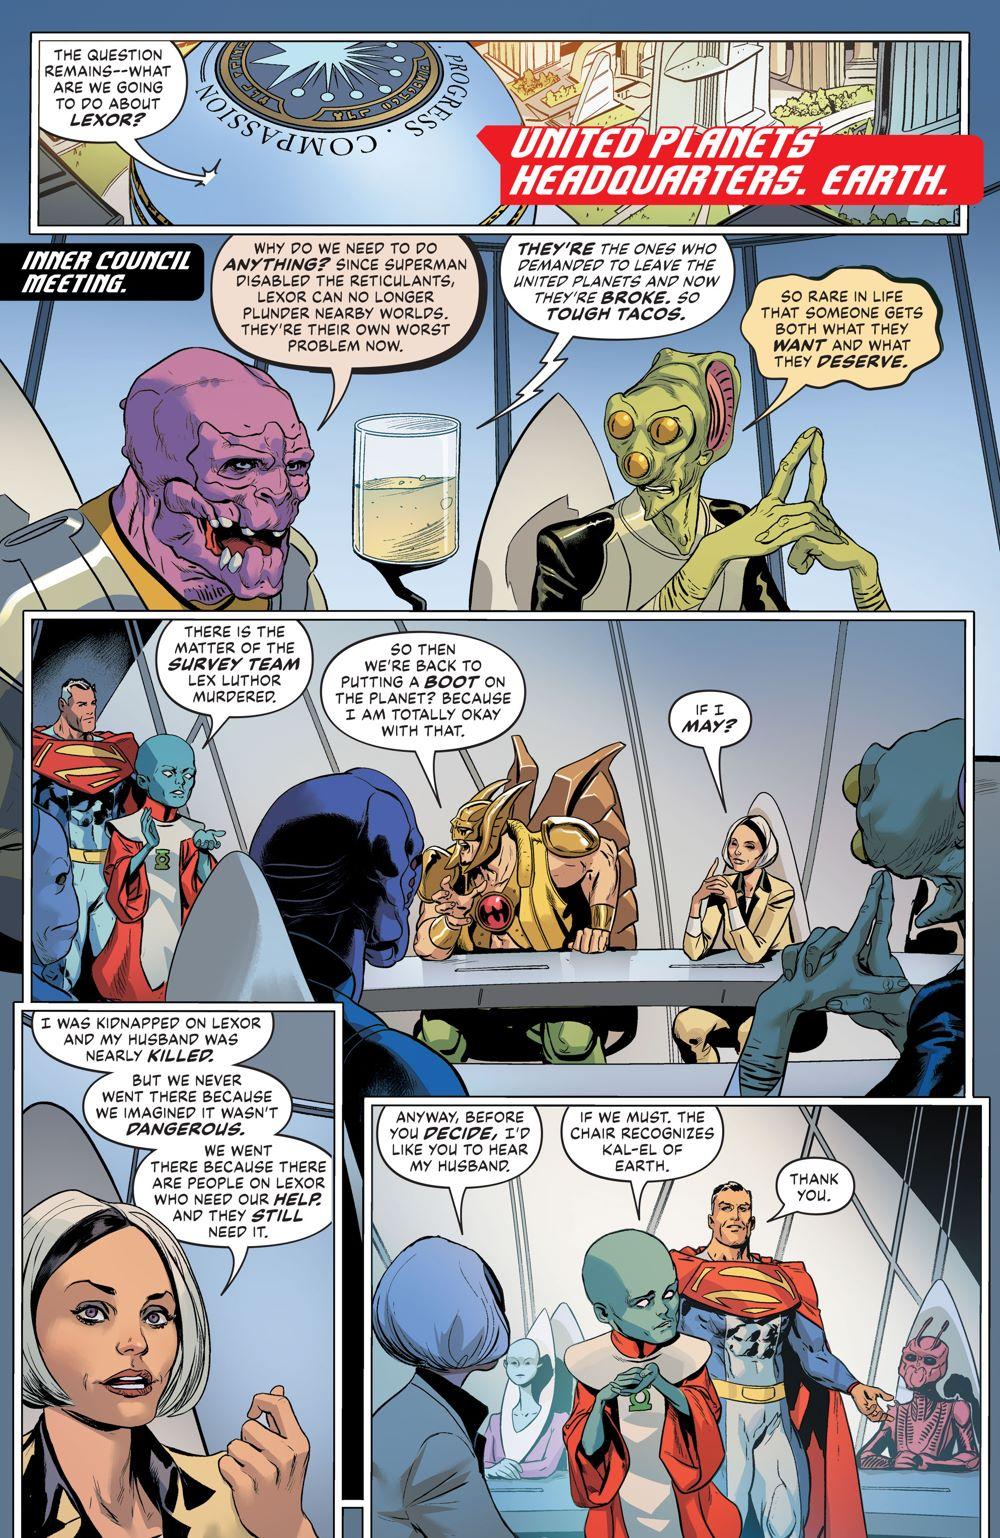 Future-State-Superman-vs-Imperious-Lex-3-2_605d4388a73d43.12775923 ComicList Previews: FUTURE STATE SUPERMAN VS IMPERIOUS LEX #3 (OF 3)